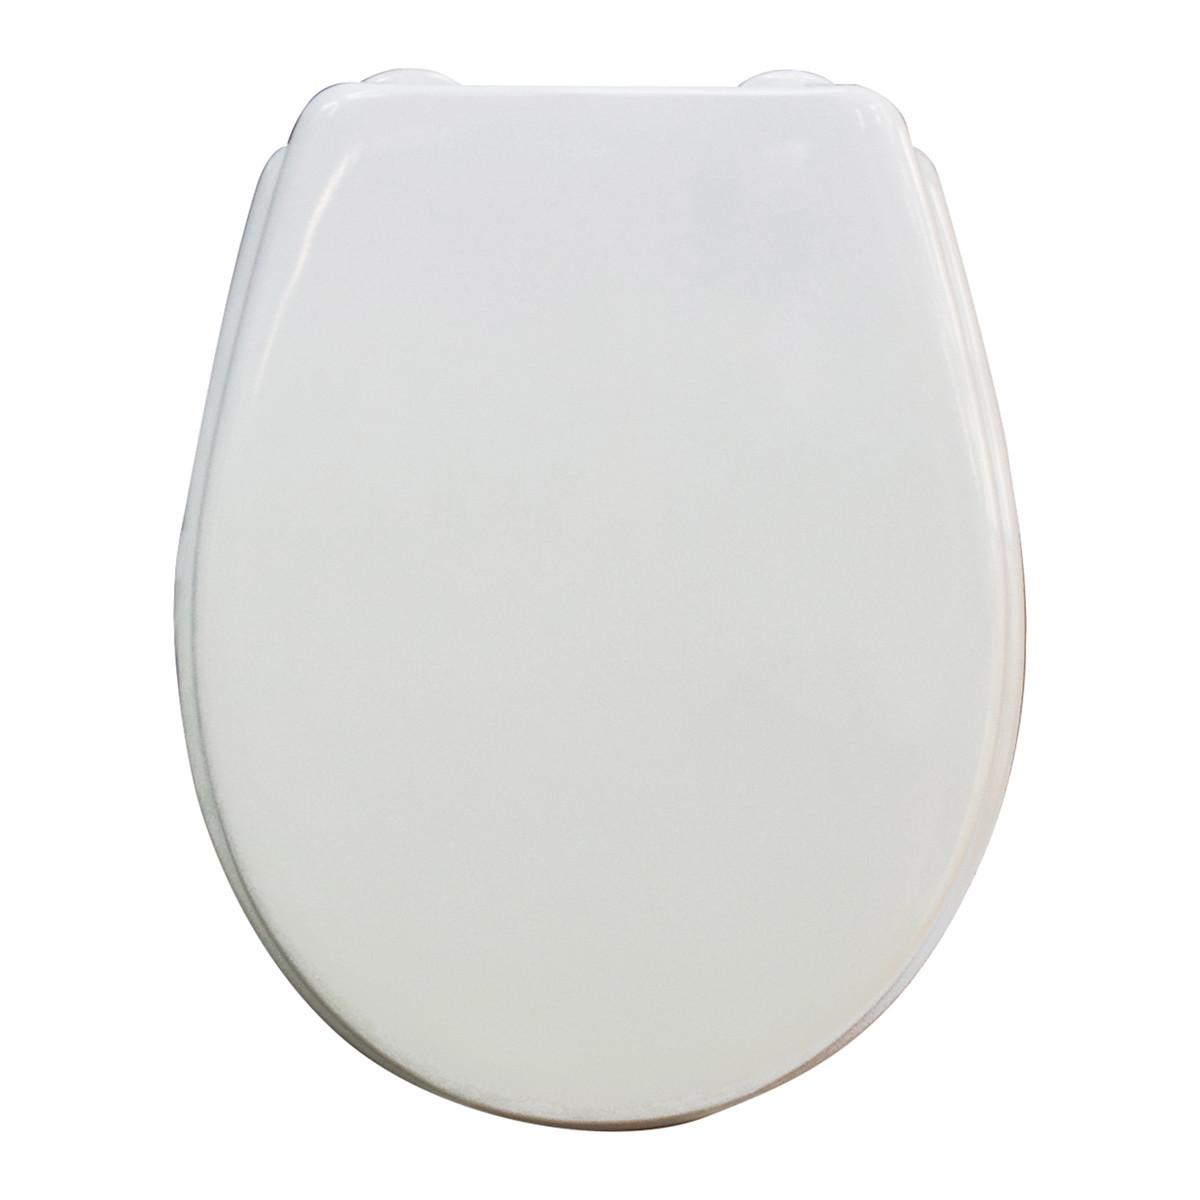 Copriwater colibr 2 bianco prezzi e offerte online for Copriwater leroy